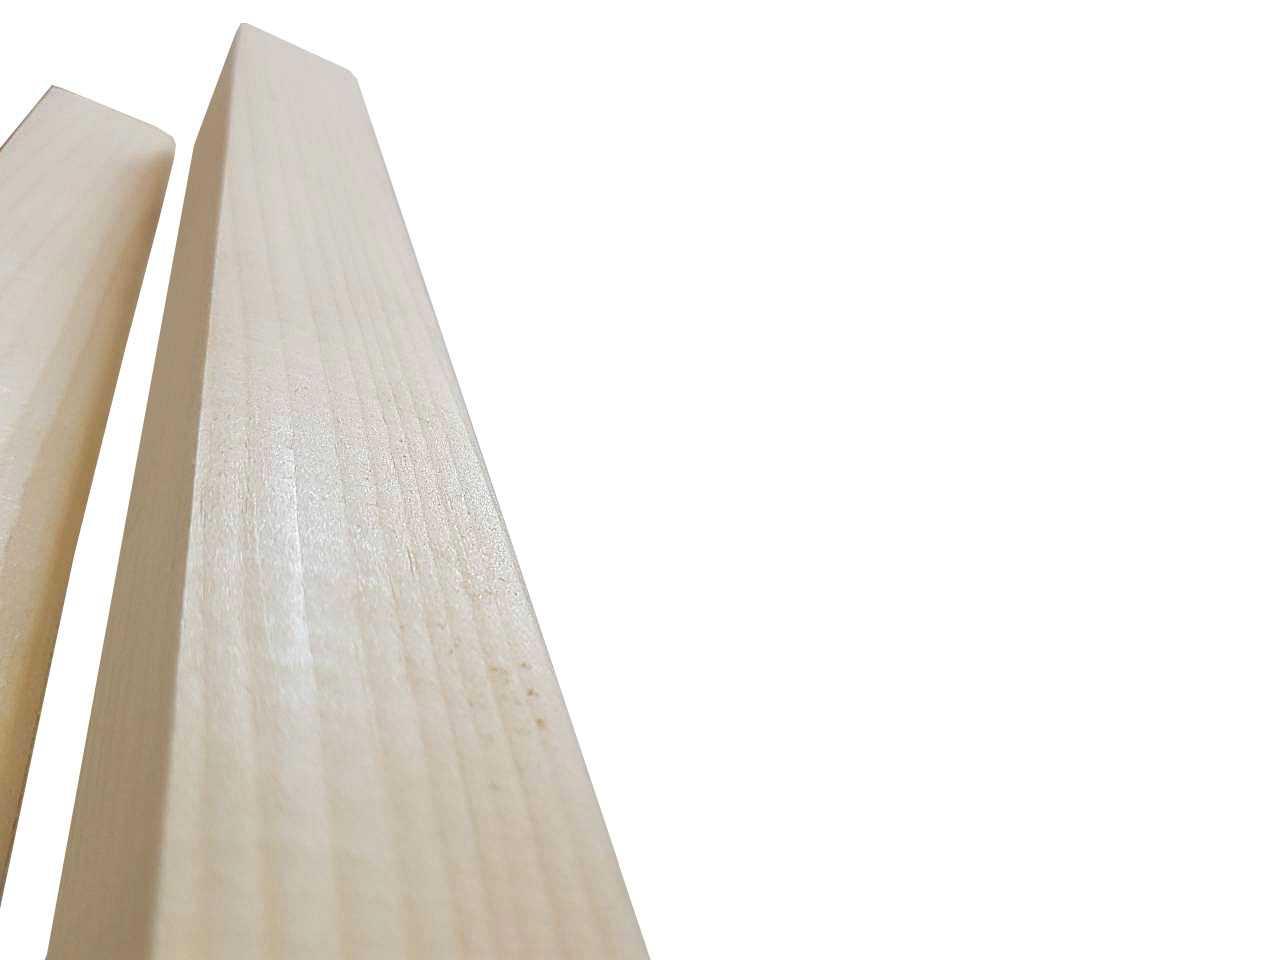 Угол из сосны наружный размер 30x30 мм.